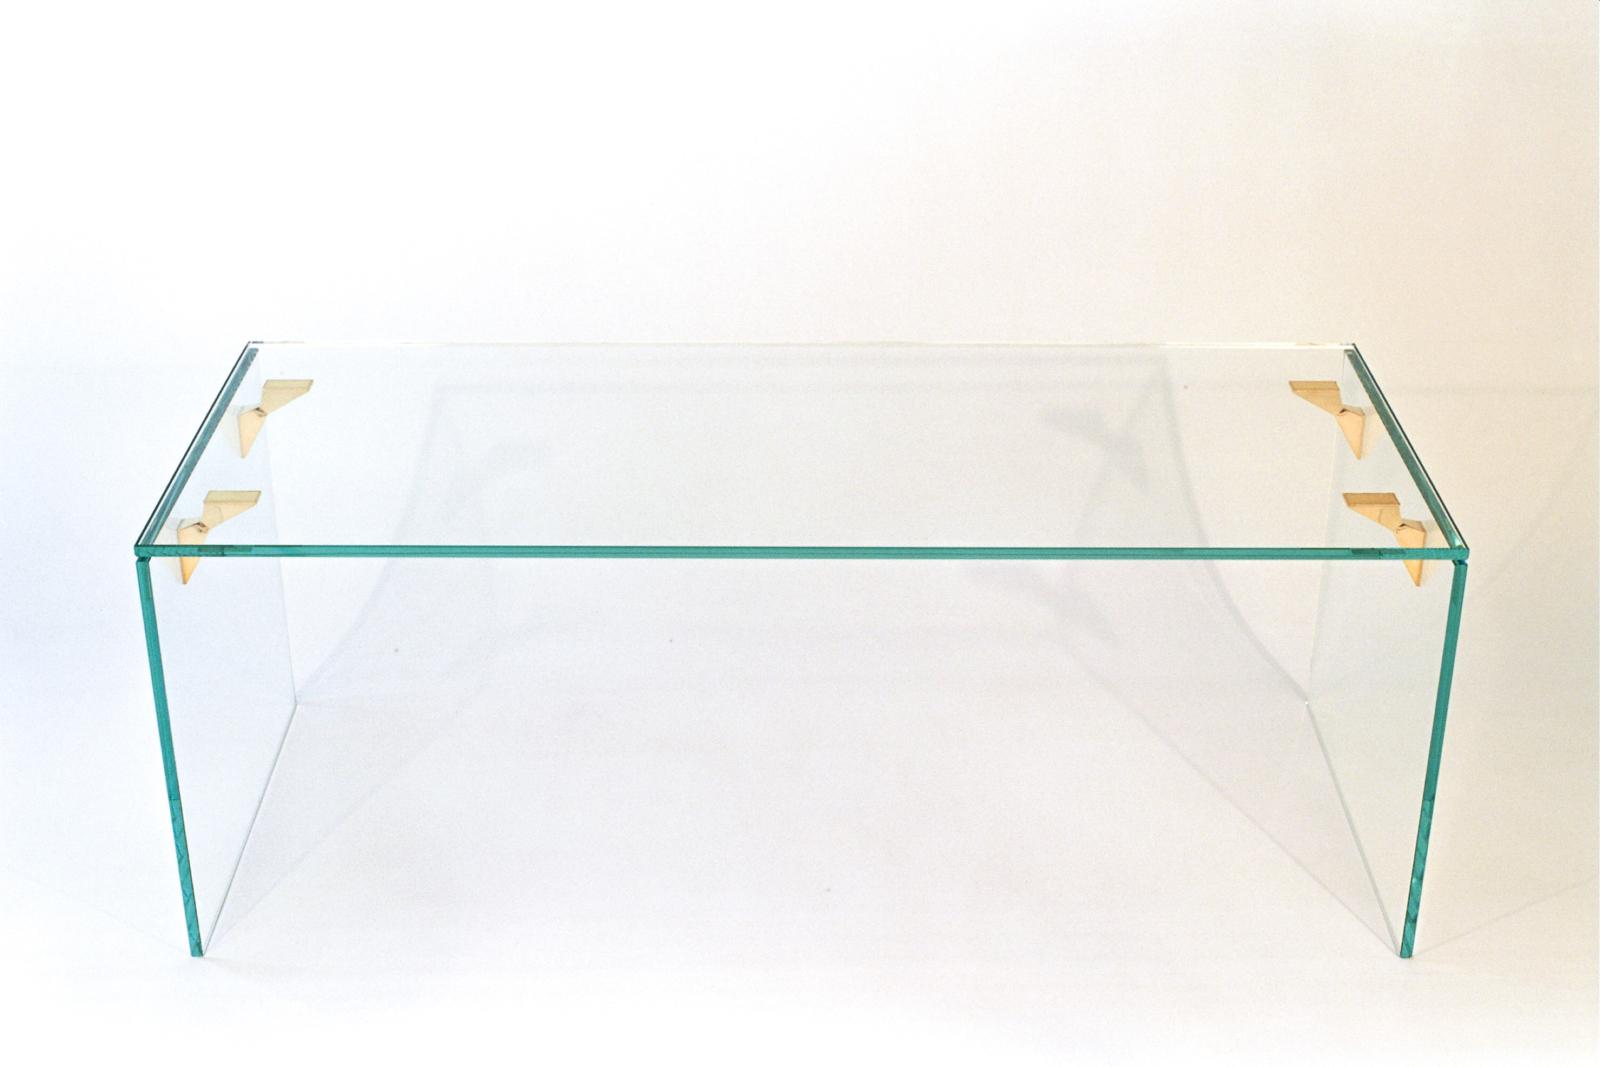 durodeco_Bow Tie Table (5).jpg